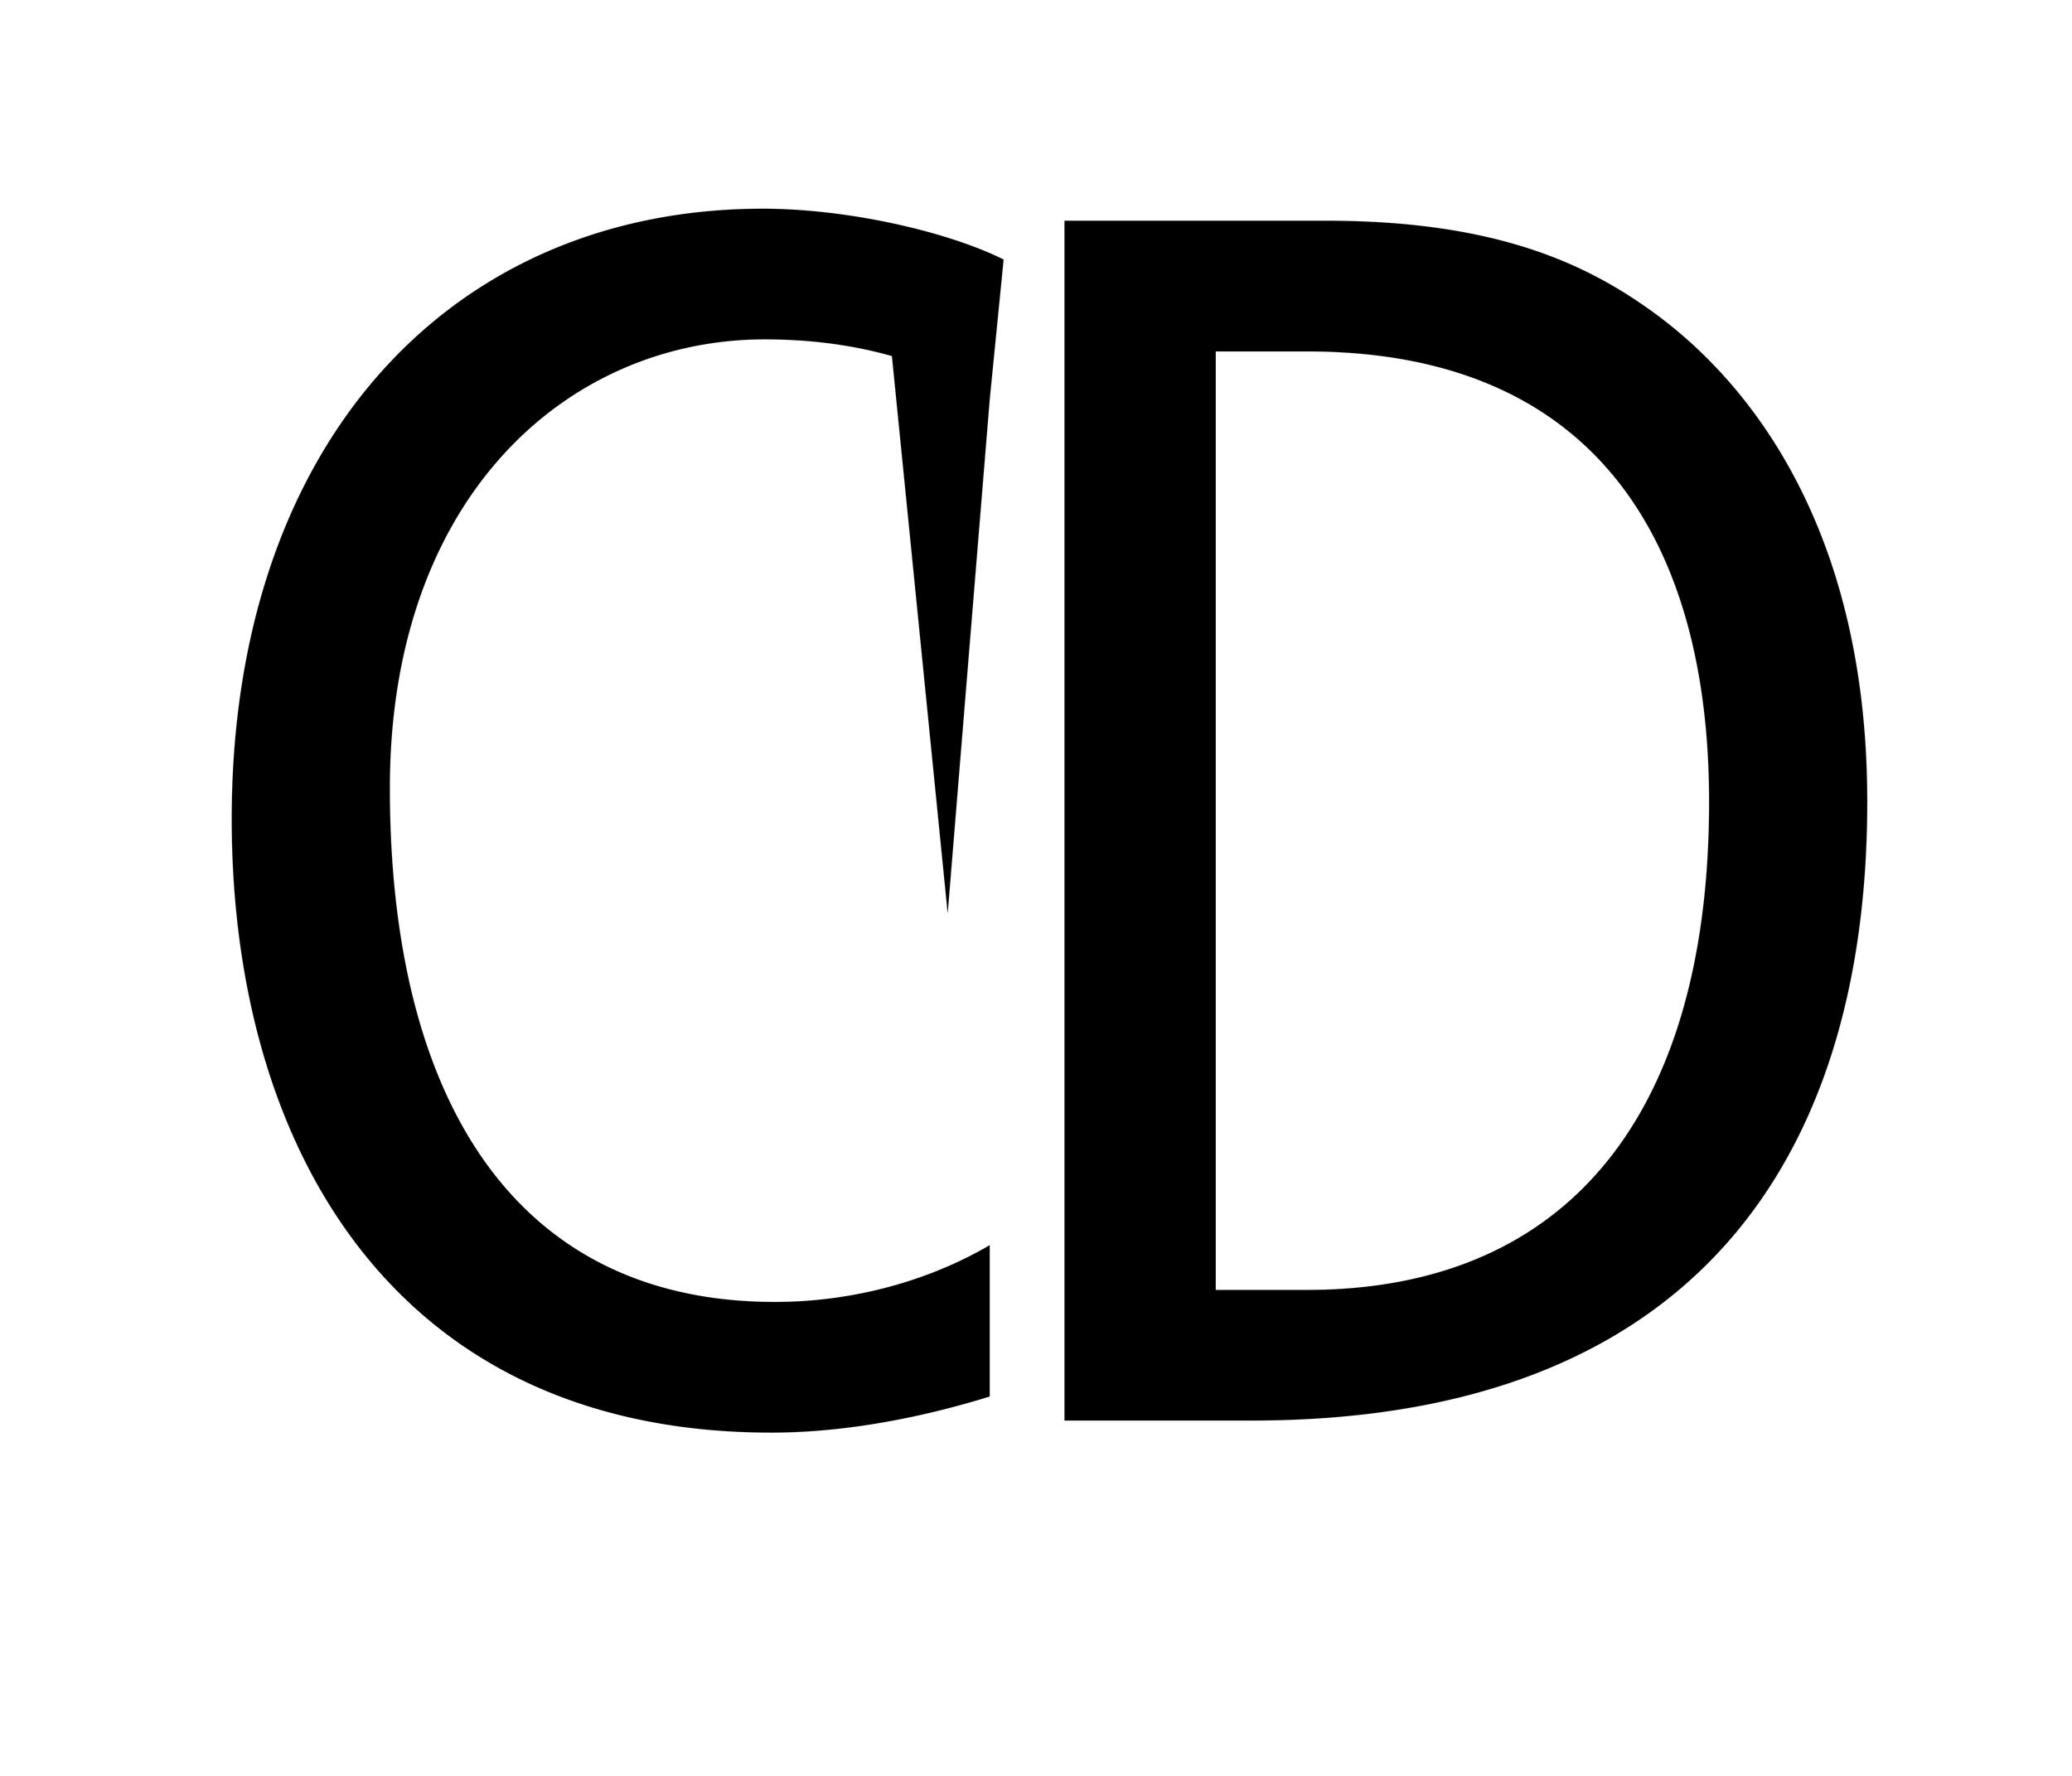 Cassie_Dee_logo.jpg